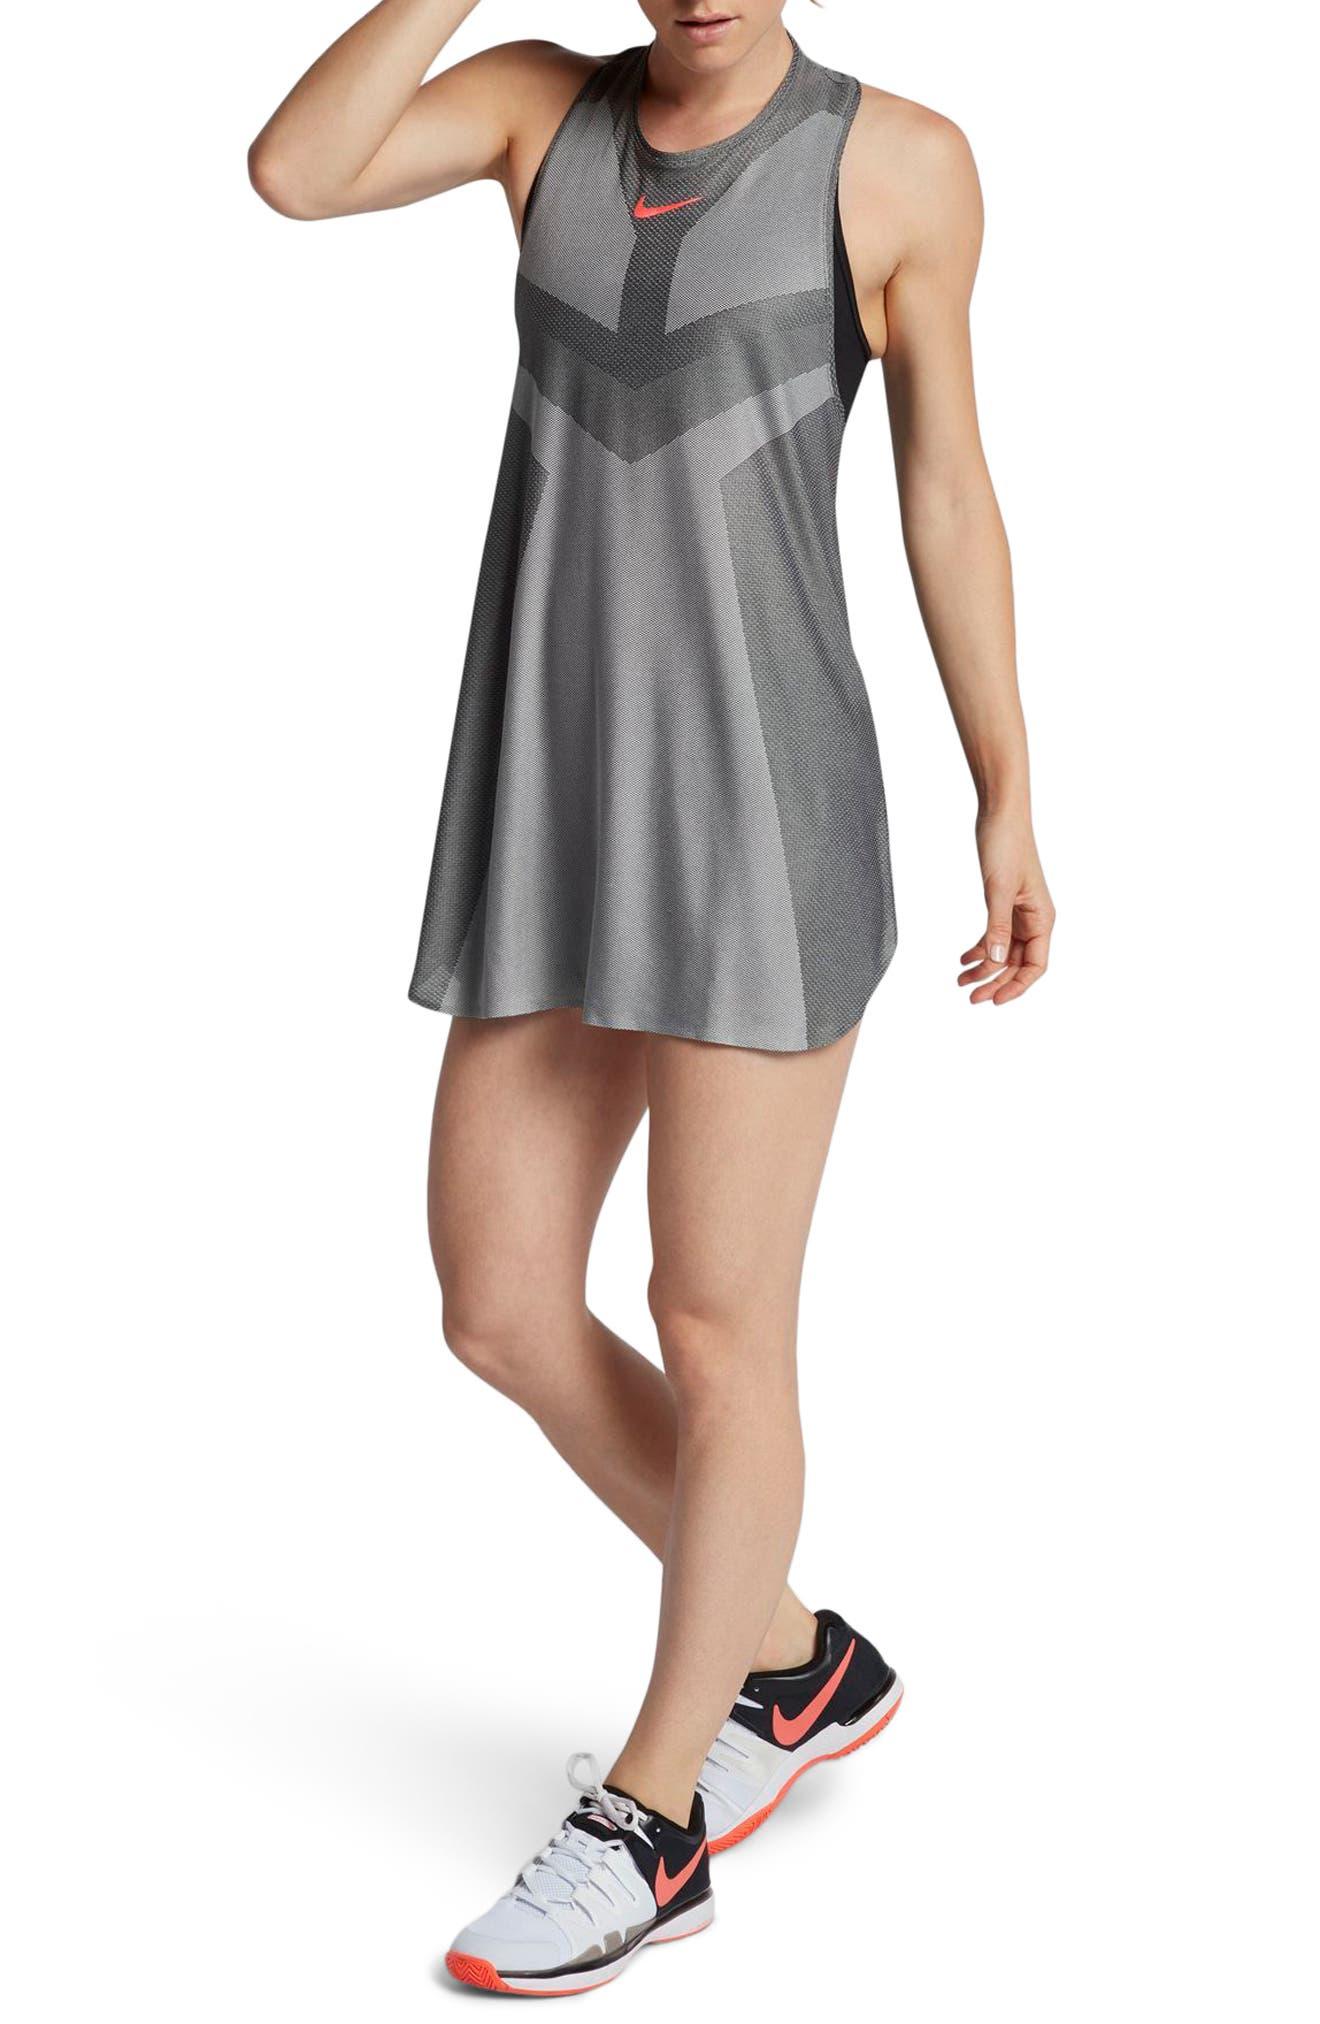 Court Dry Slam Tennis Dress,                         Main,                         color, Matte Silver/ Hot Punch